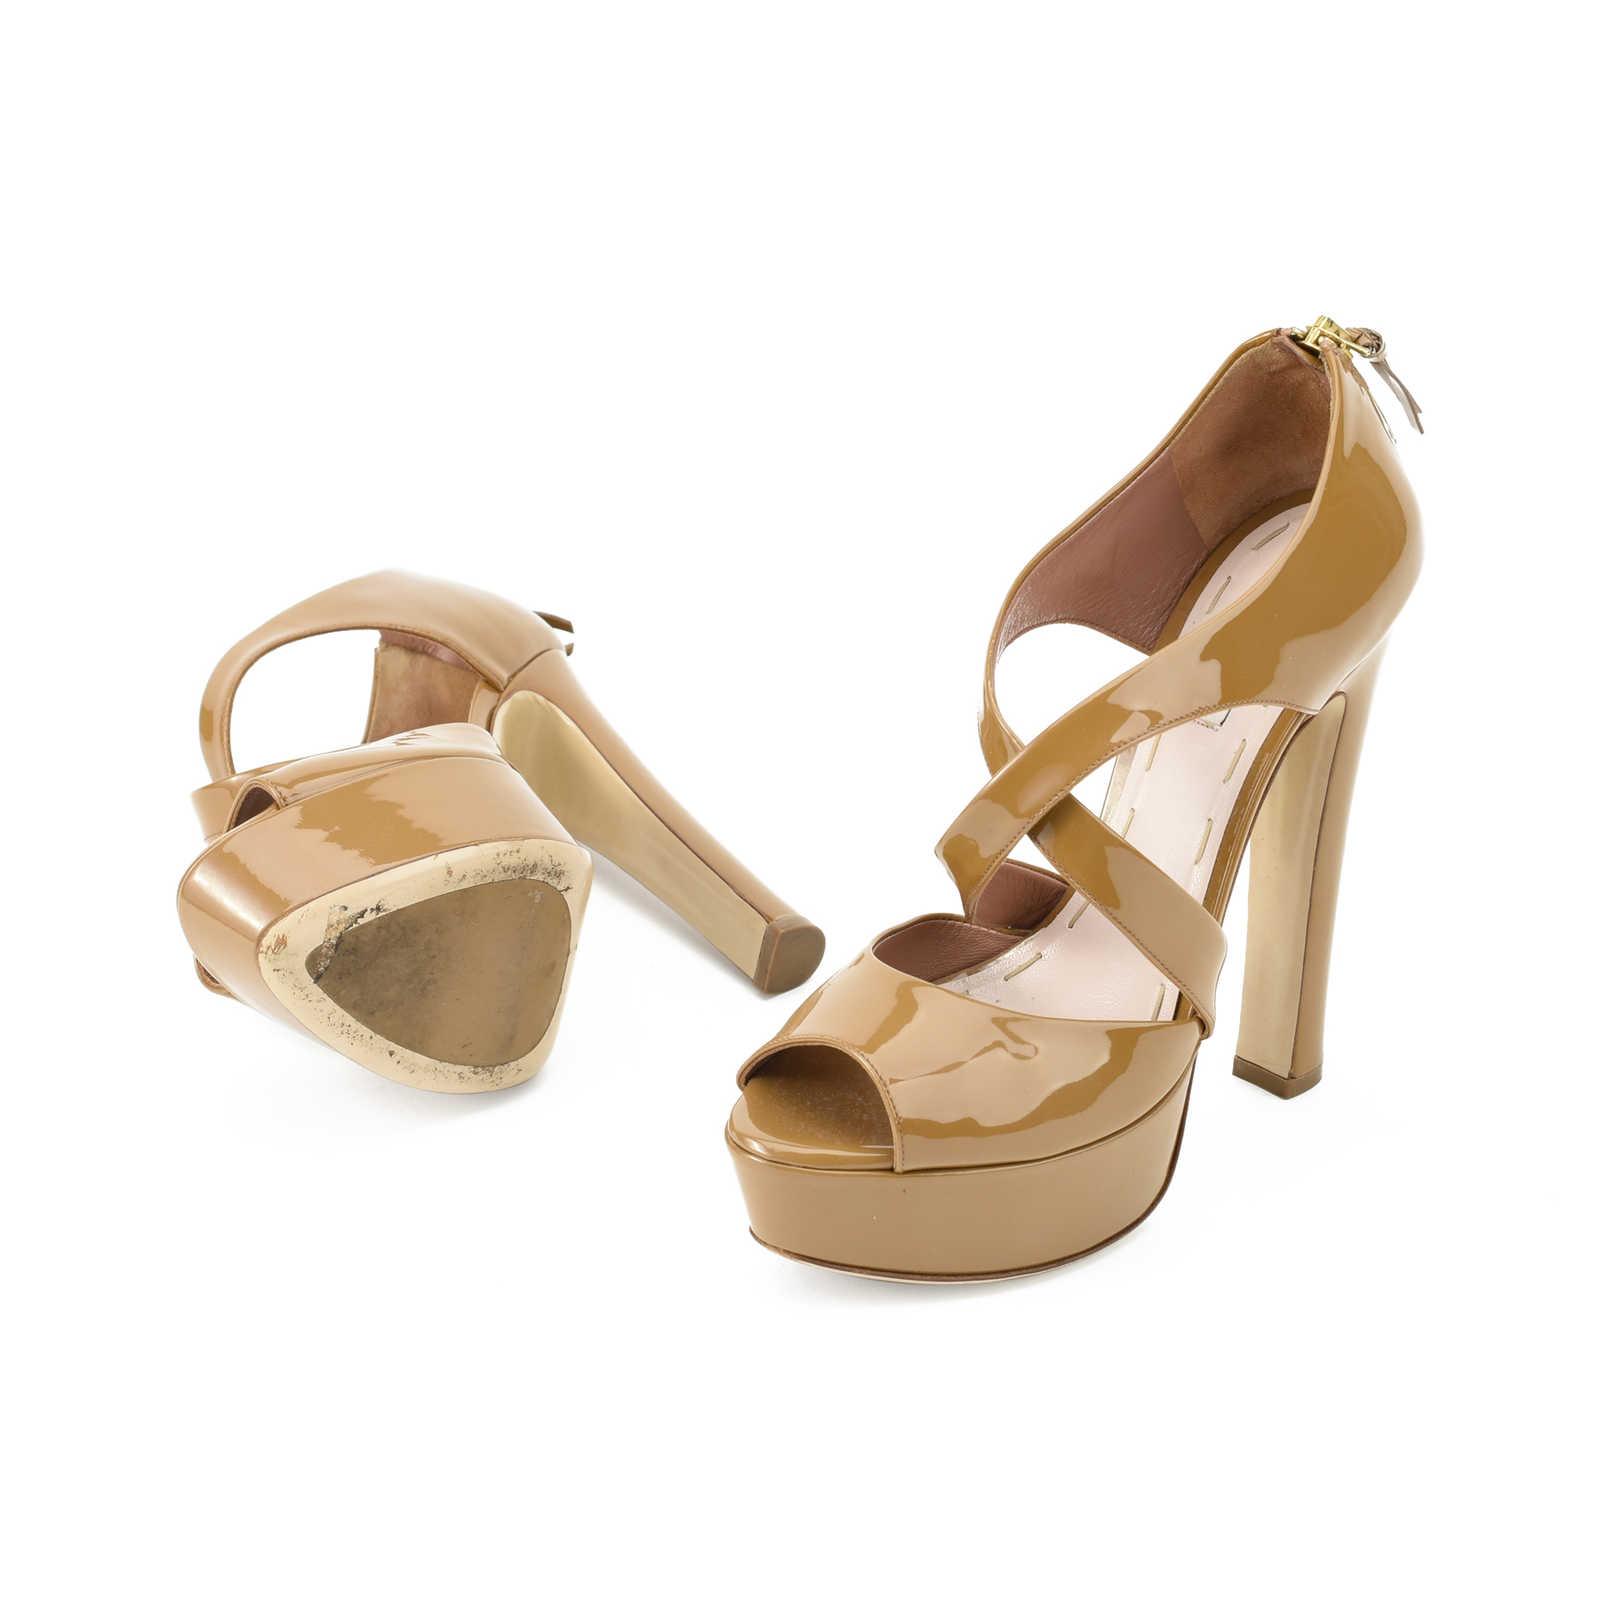 11e7a44f0c5f Miu Miu Patent Platform Sandals Great Deals Sale Good Selling Free Shipping  Factory Outlet Hot Sale